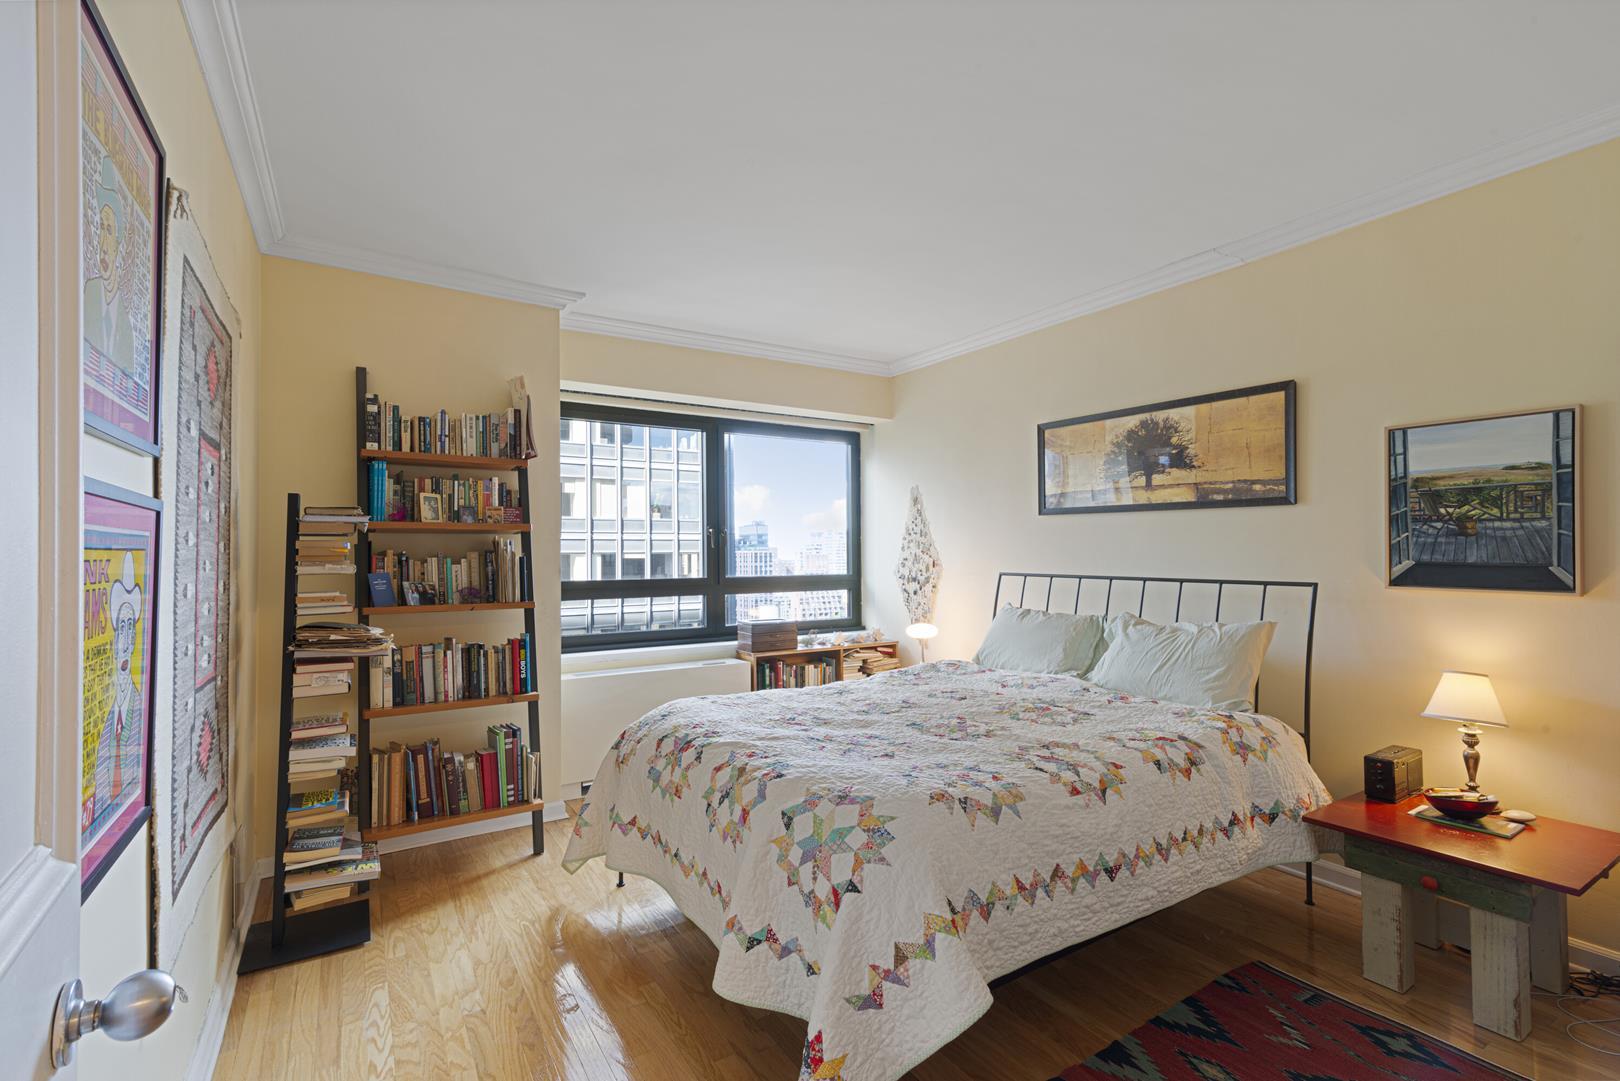 240 East 47th Street Turtle Bay New York NY 10017